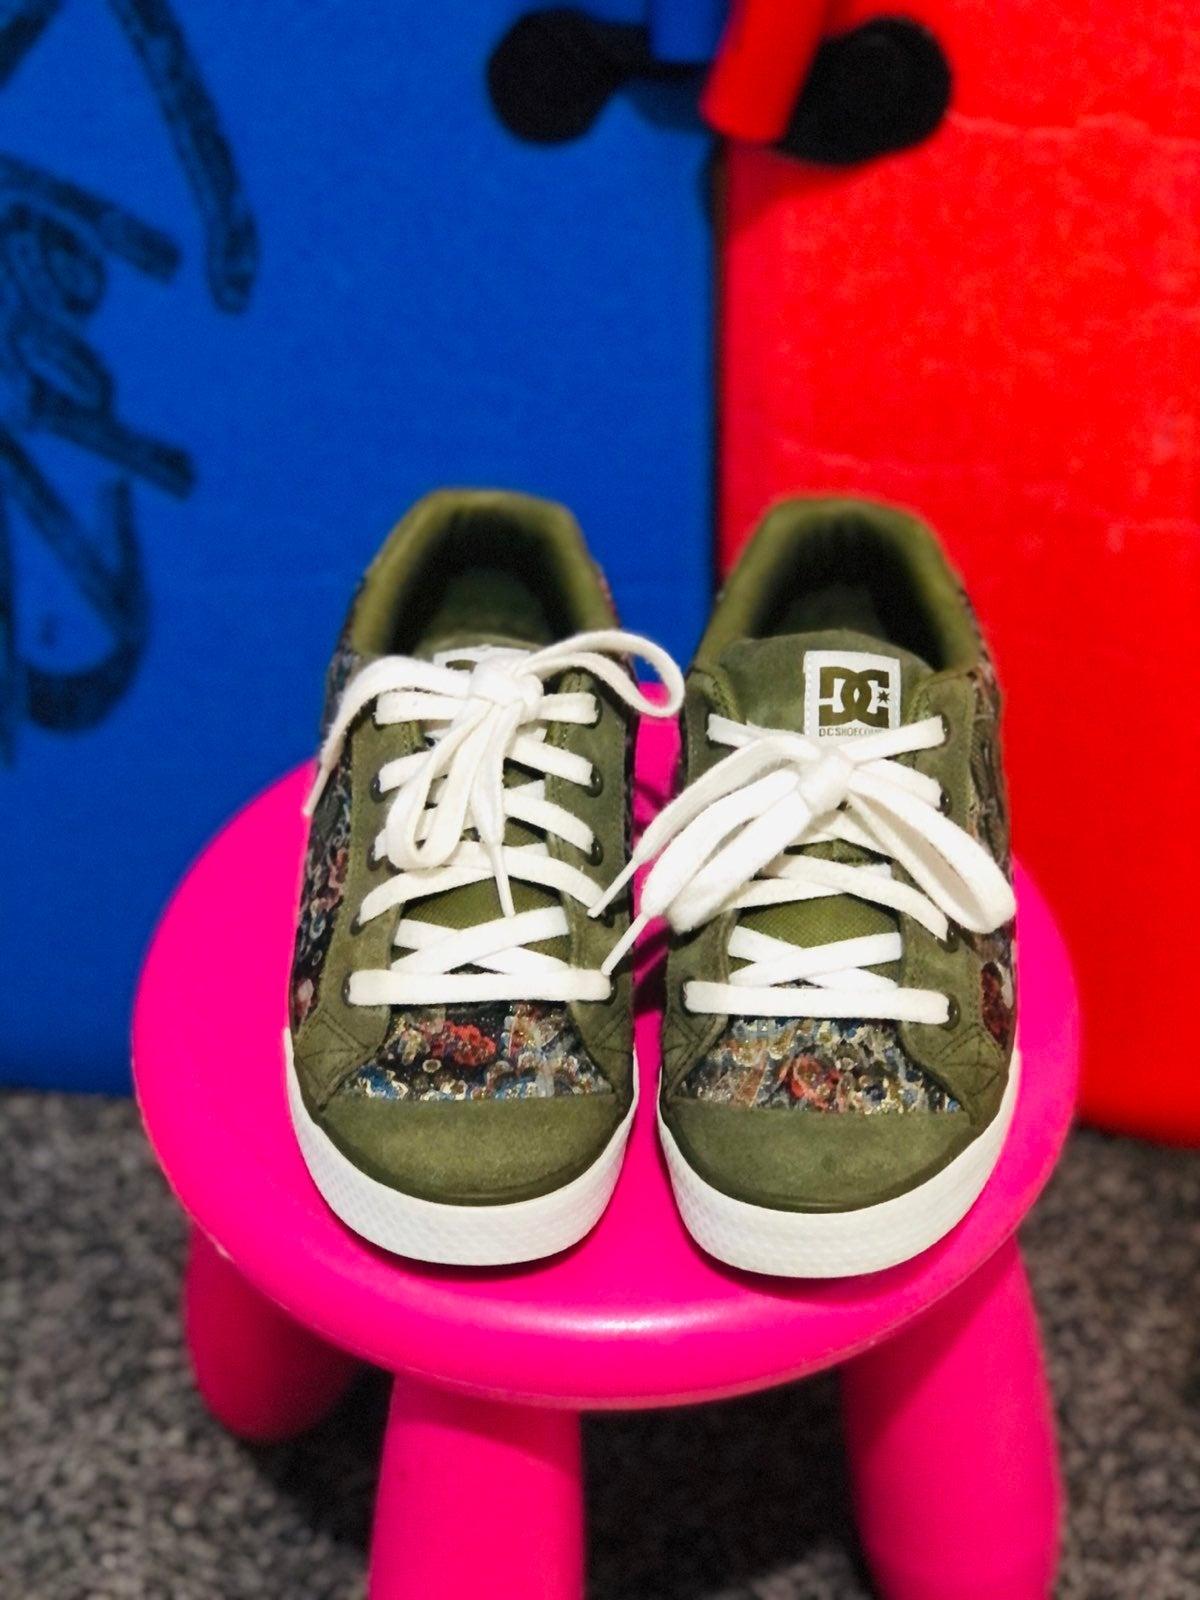 DC Shoe Co USA Skateboarding Shoes, Pain